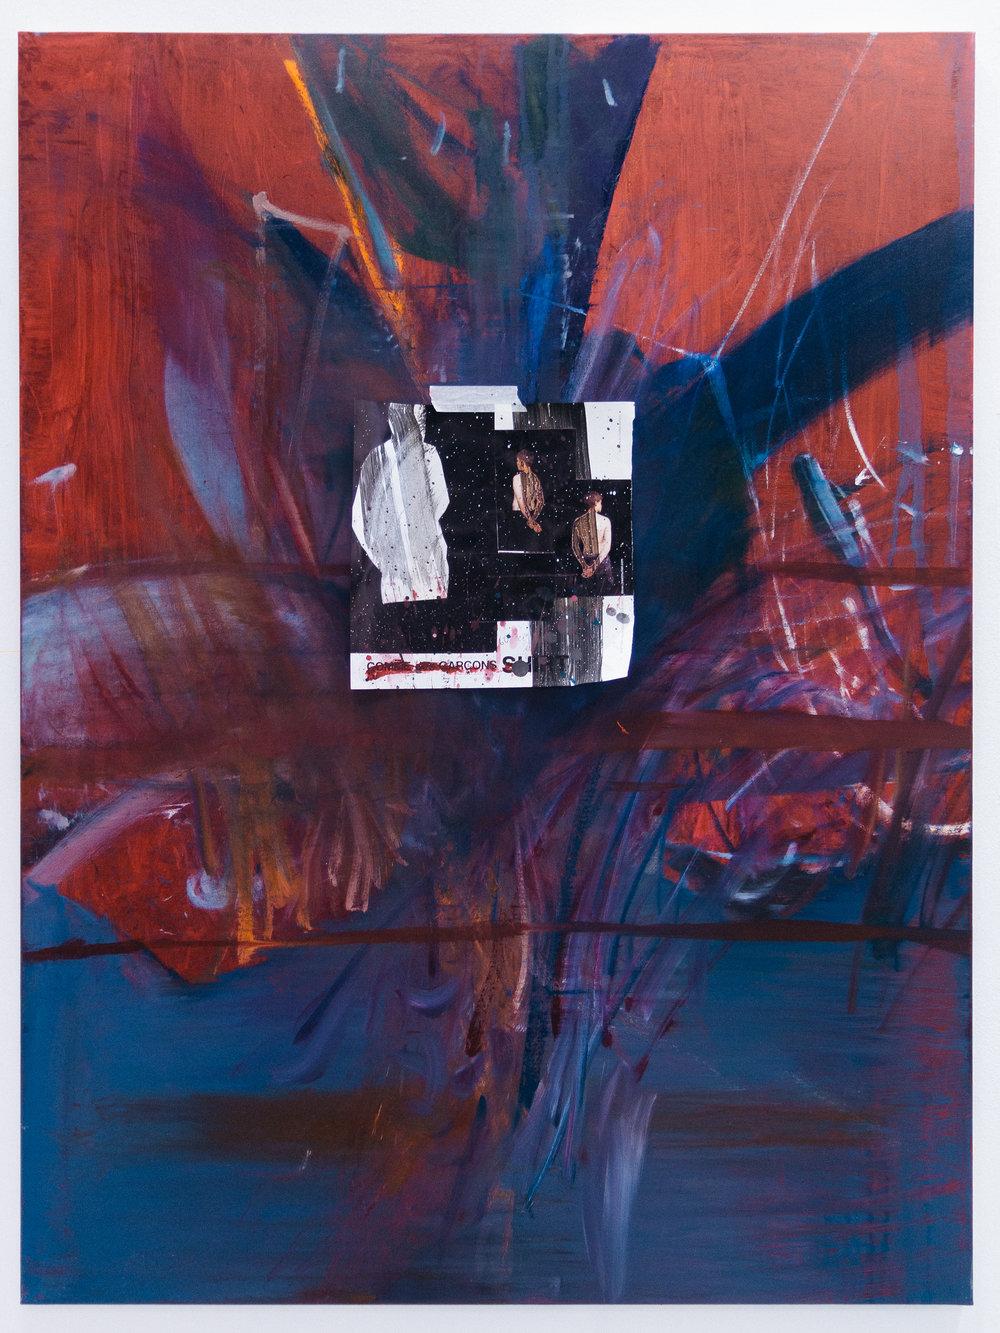 Diptych pt. 3: Firenze , 2017  Oil on canvas  120 x 100 cm